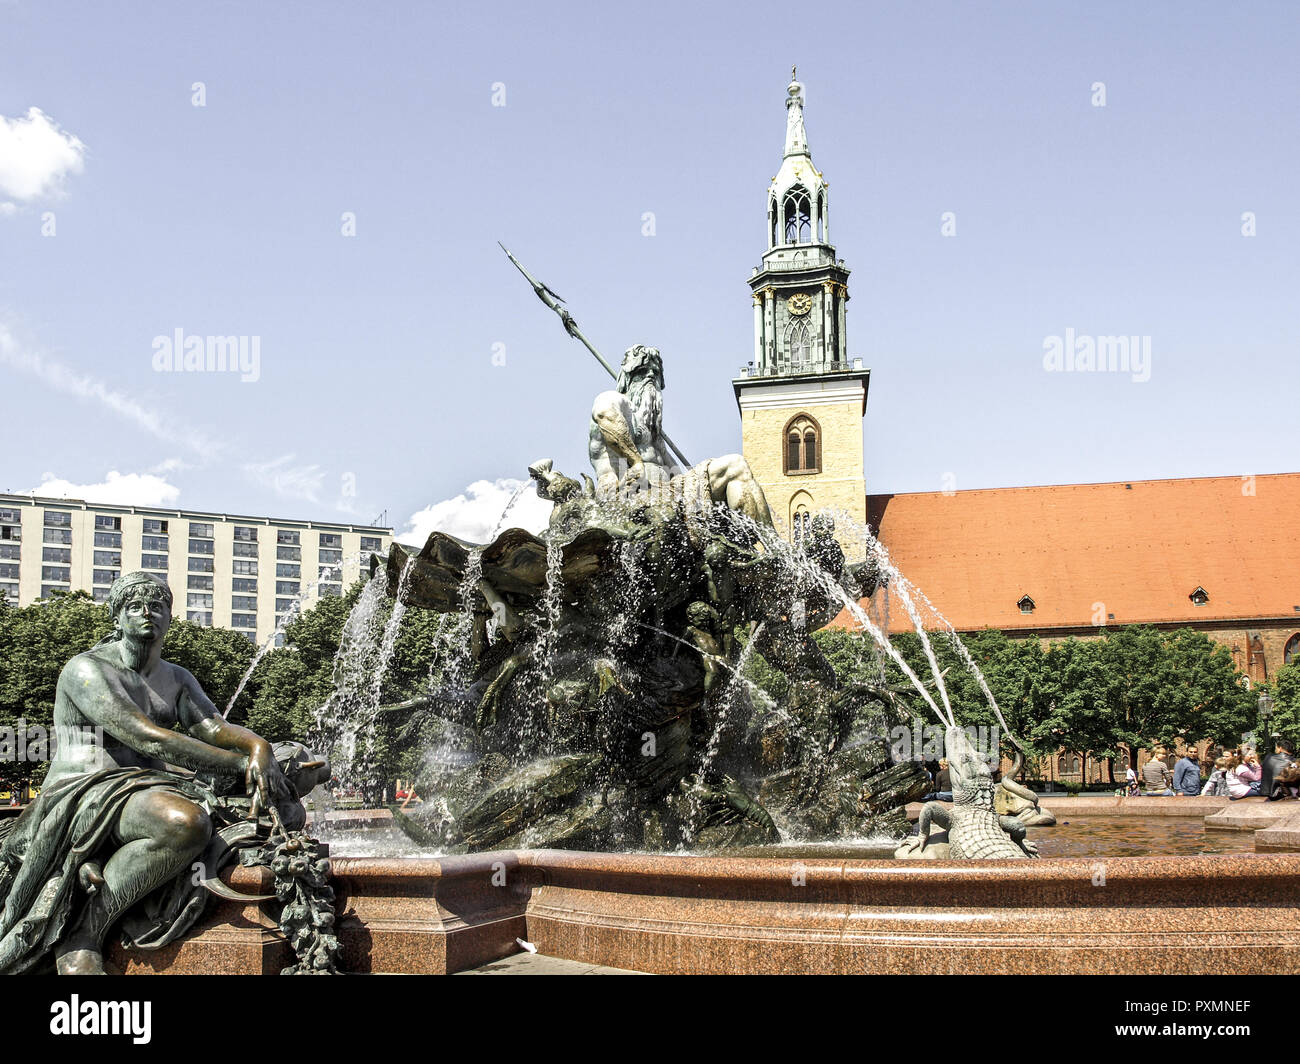 Deutschland, Berlin, Europa, Hauptstadt, Stadt, Sehenswuerdigkeit, Alexanderplatz, Neptunbrunnen, Detail, Grossstadt, Berlin-Mitte, Brunnen, Brunnenfi - Stock Image